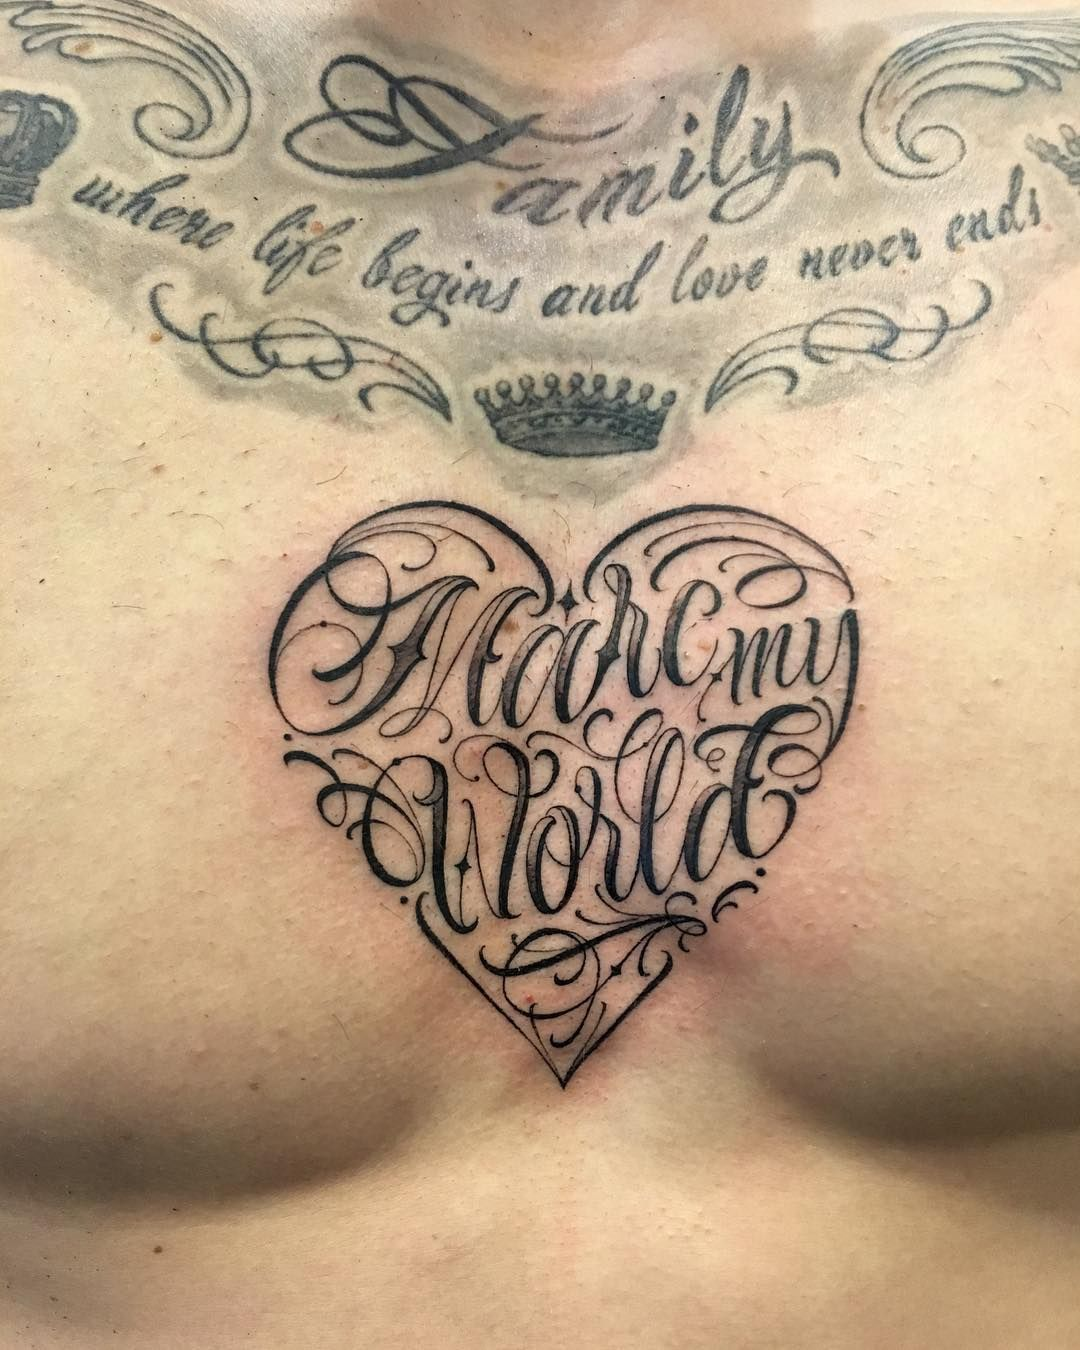 4 794 Likes 92 Comments Brigantetattoo Brigantetattoo On Instagram Coming Soon The Complete Al Tattoo Lettering Styles Tattoo Lettering Tattoos